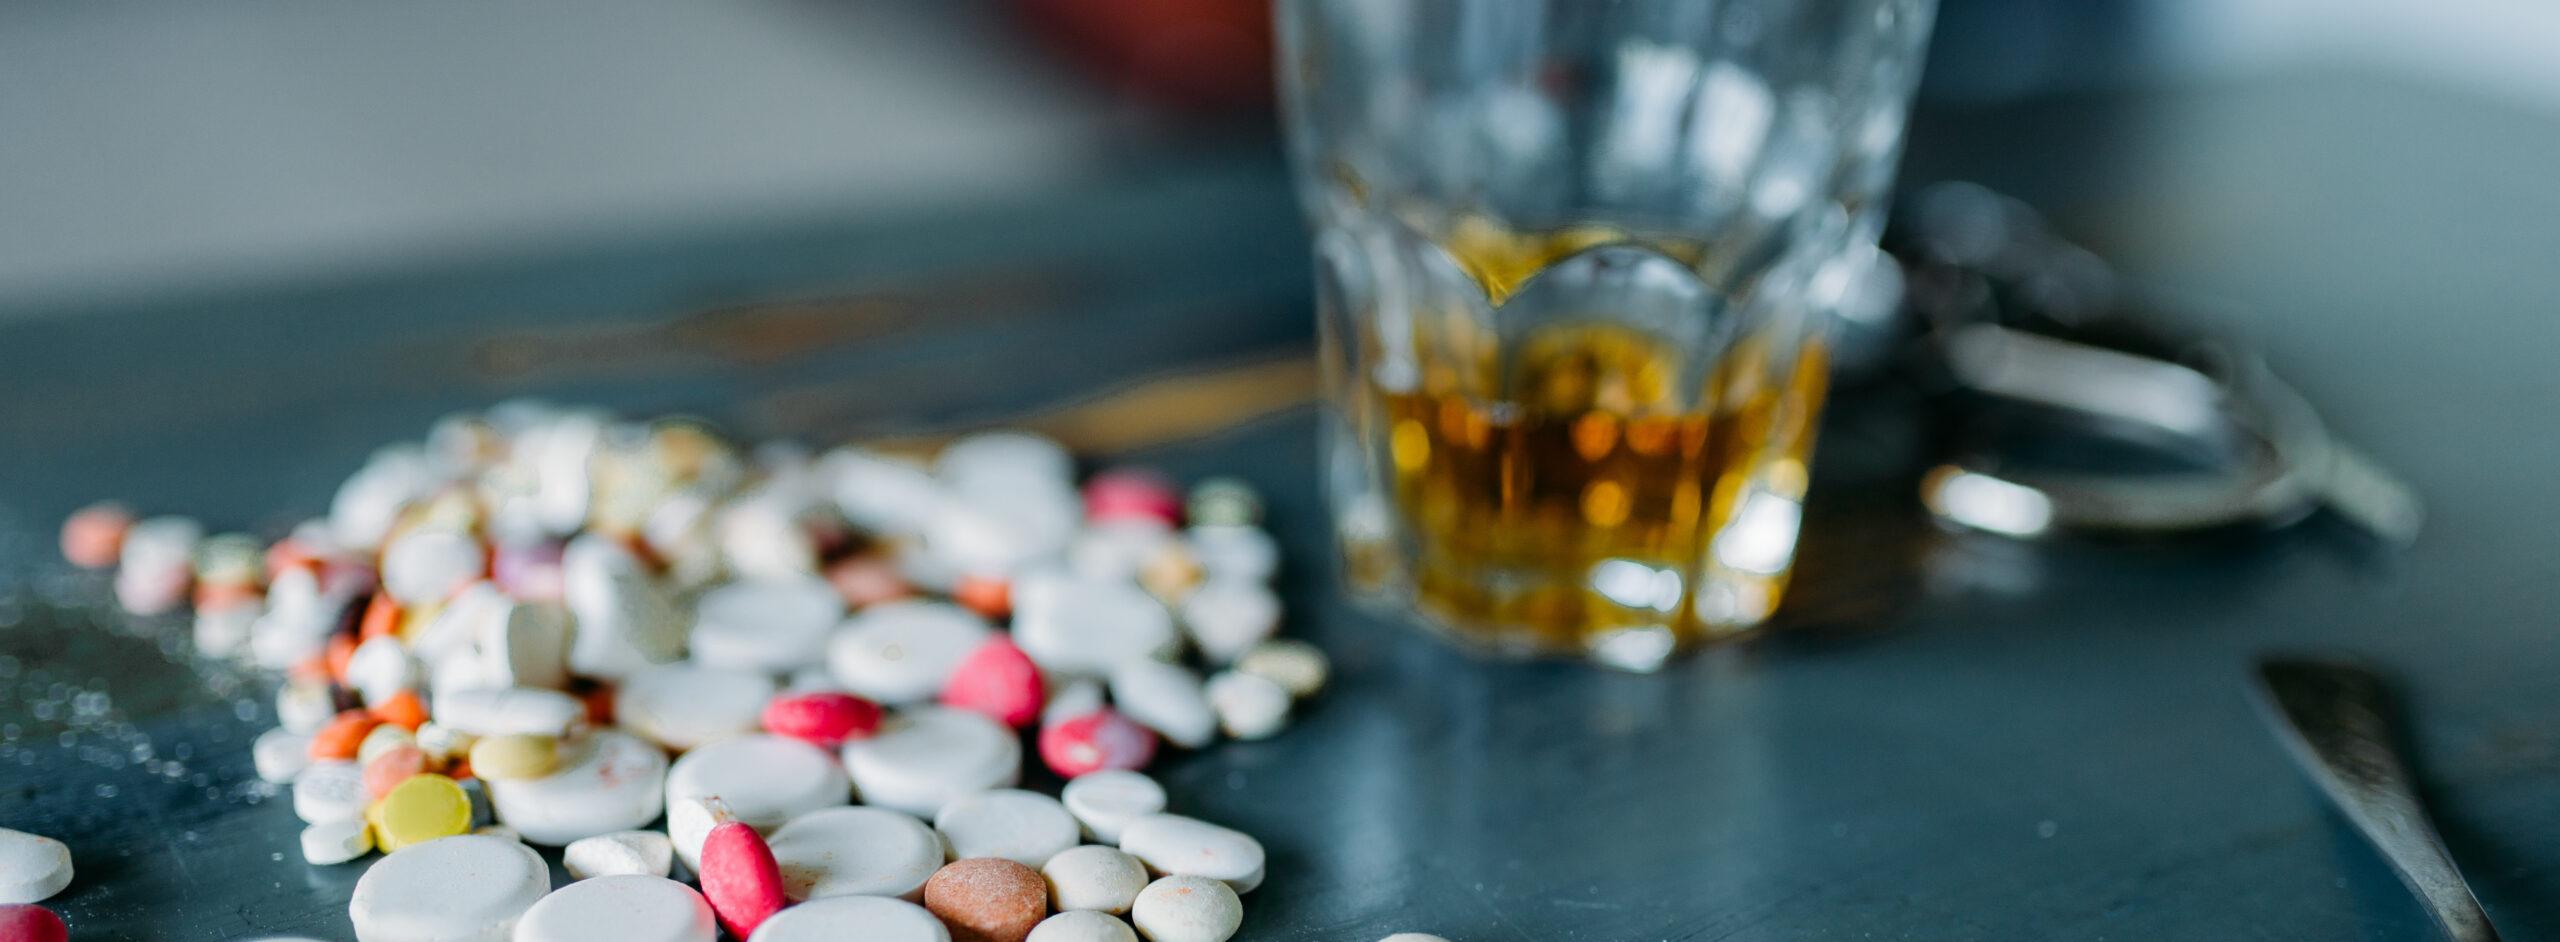 Addictive Disorders Image